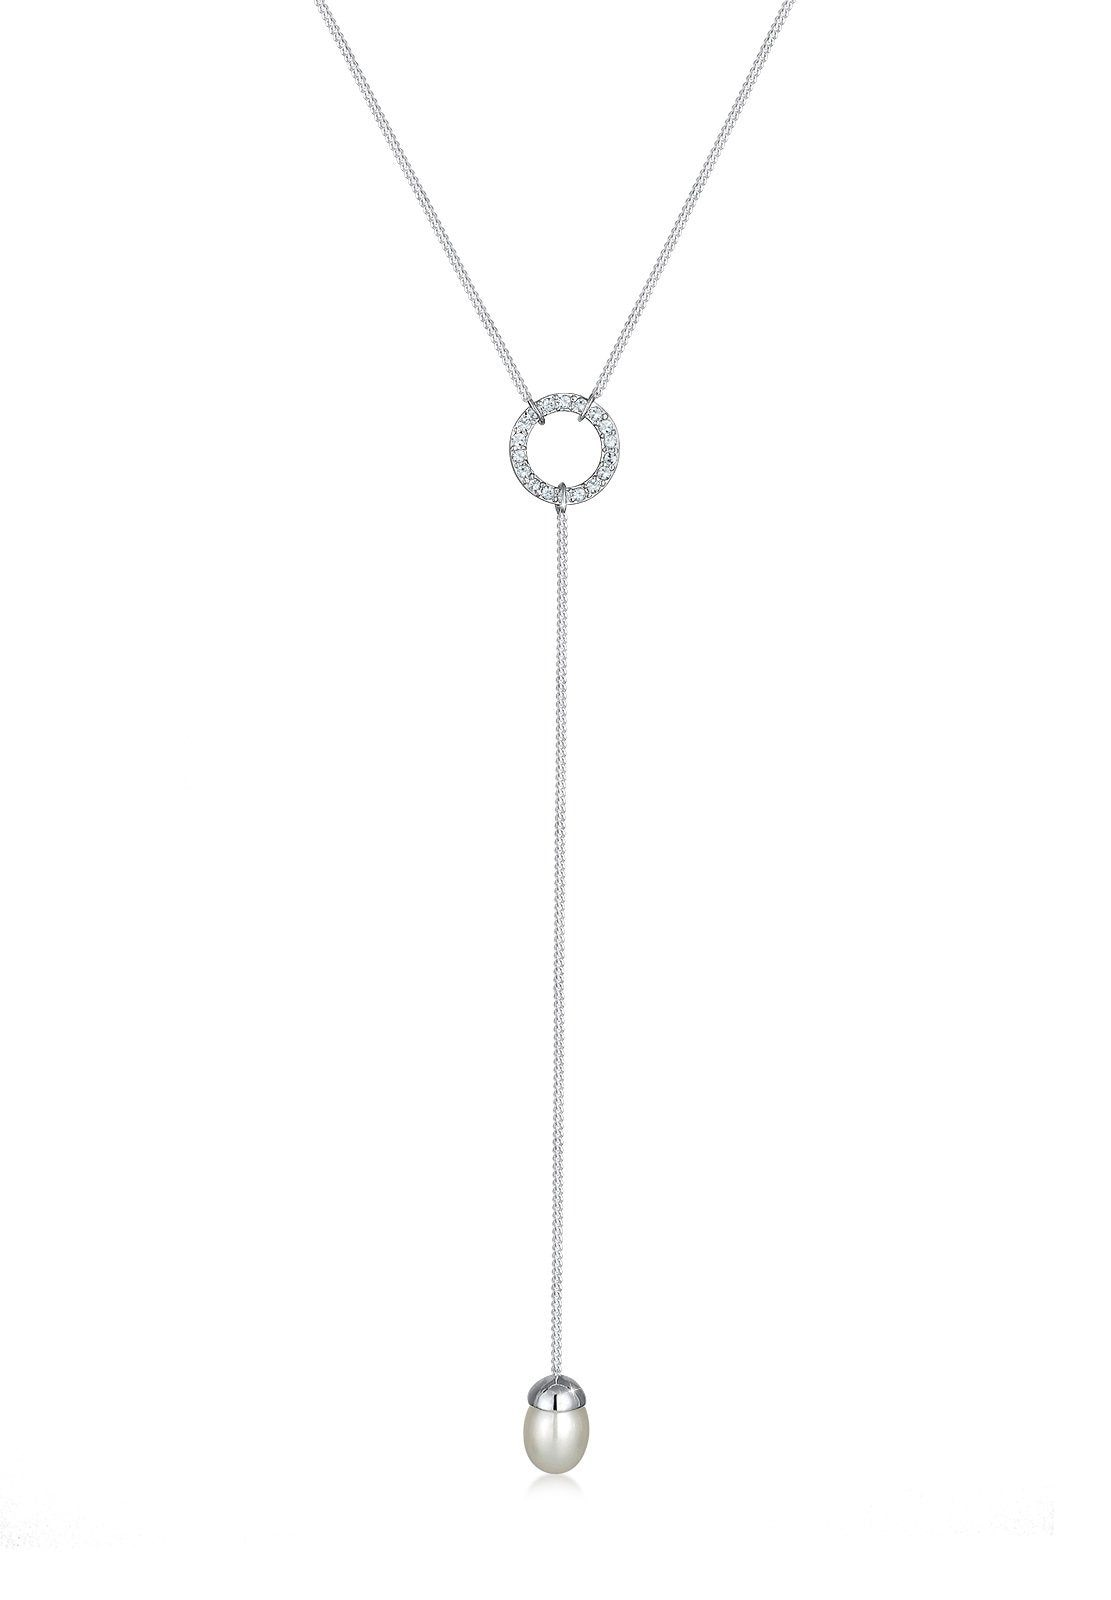 Elli Perlenkette Y-Kette Swarovski Kristalle Perle 925 Silber | Schmuck > Halsketten > Perlenketten | Elli